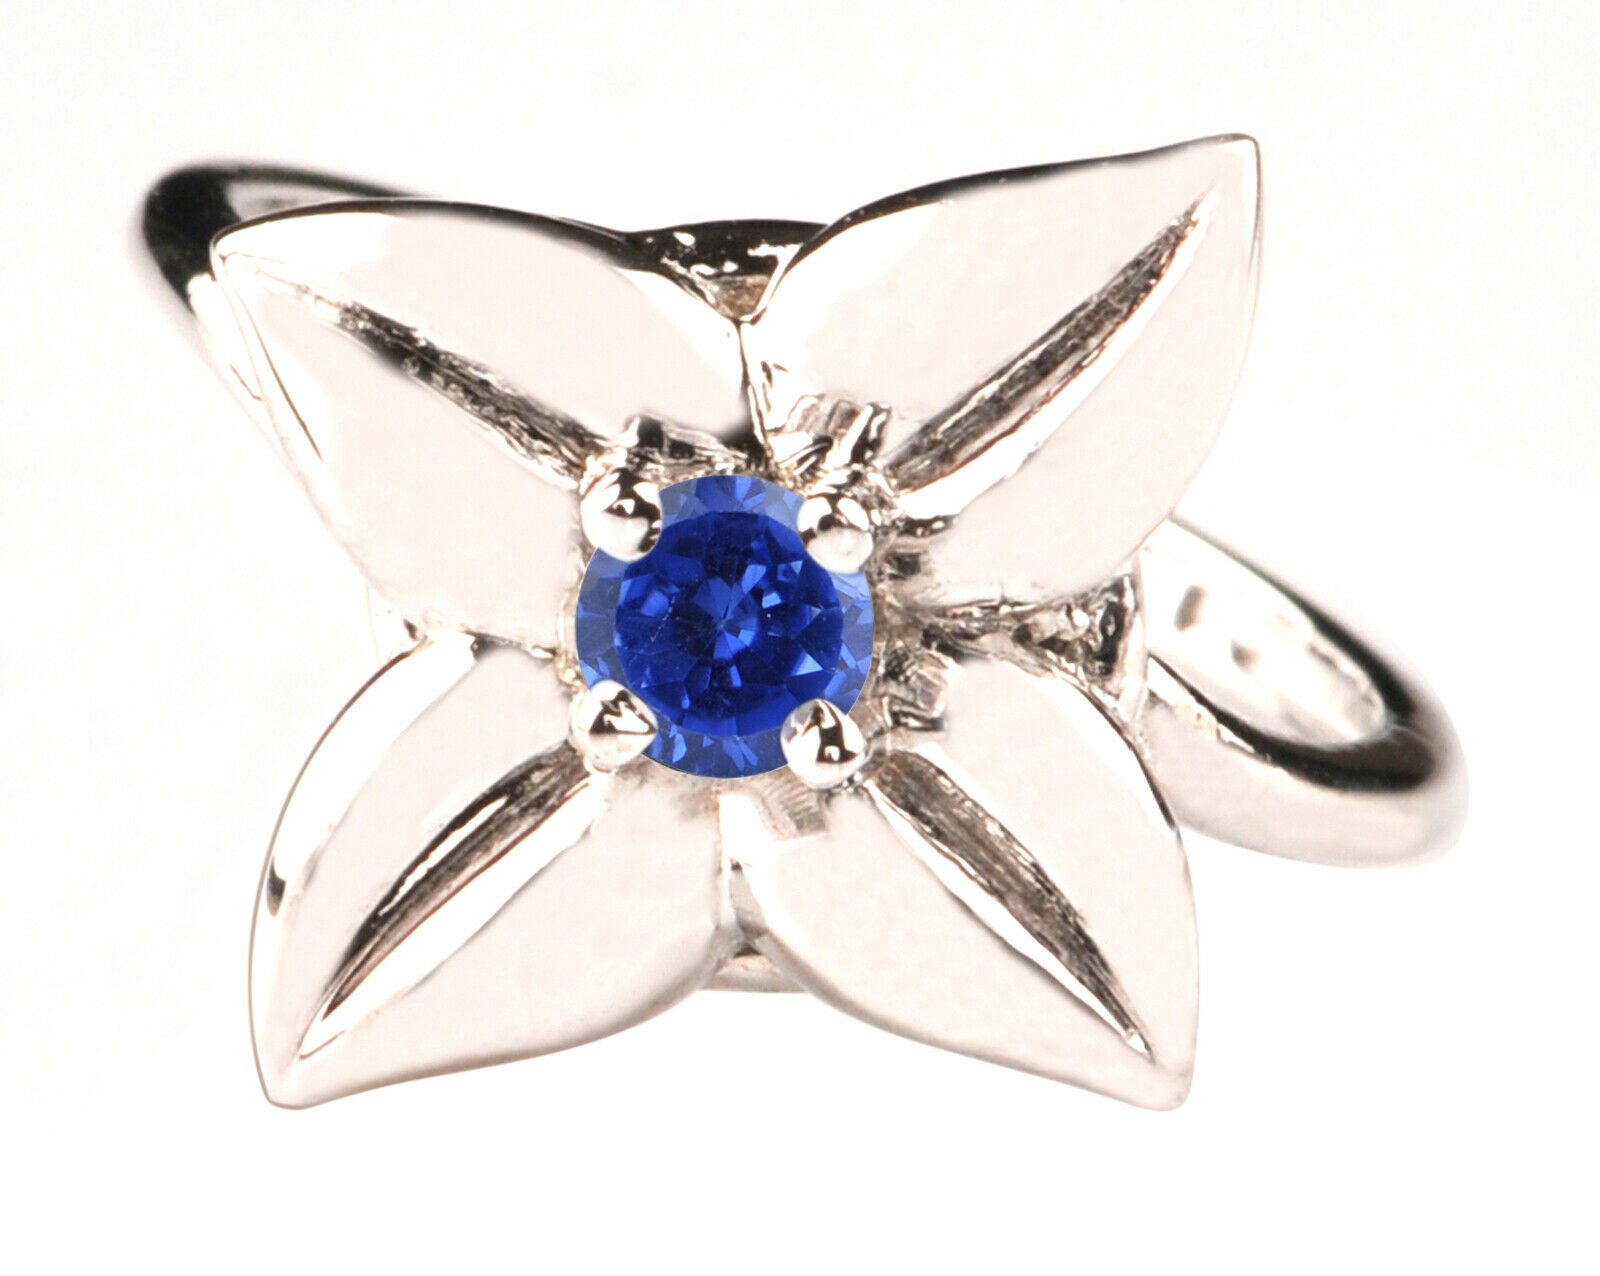 100% Natural blueee Tanzanite 1.20CT Round Cut 14KT White gold Wedding Ring